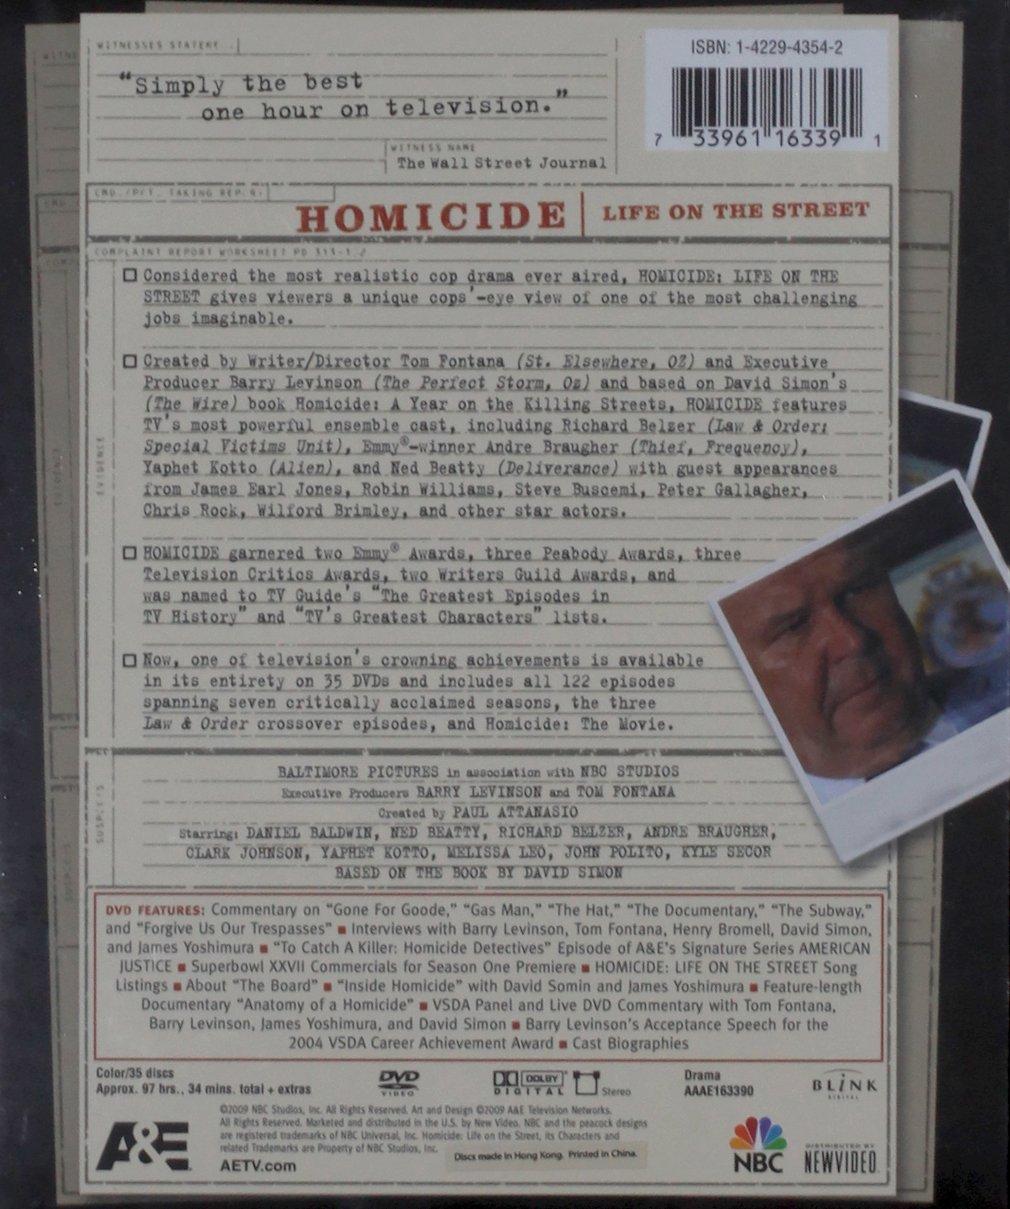 Amazon.com: Homicide: Life on the Street - The Complete Series: Richard  Belzer, Clark Johnson, Yaphet Kotto, Kyle Secor, Tom Fontana: Movies & TV